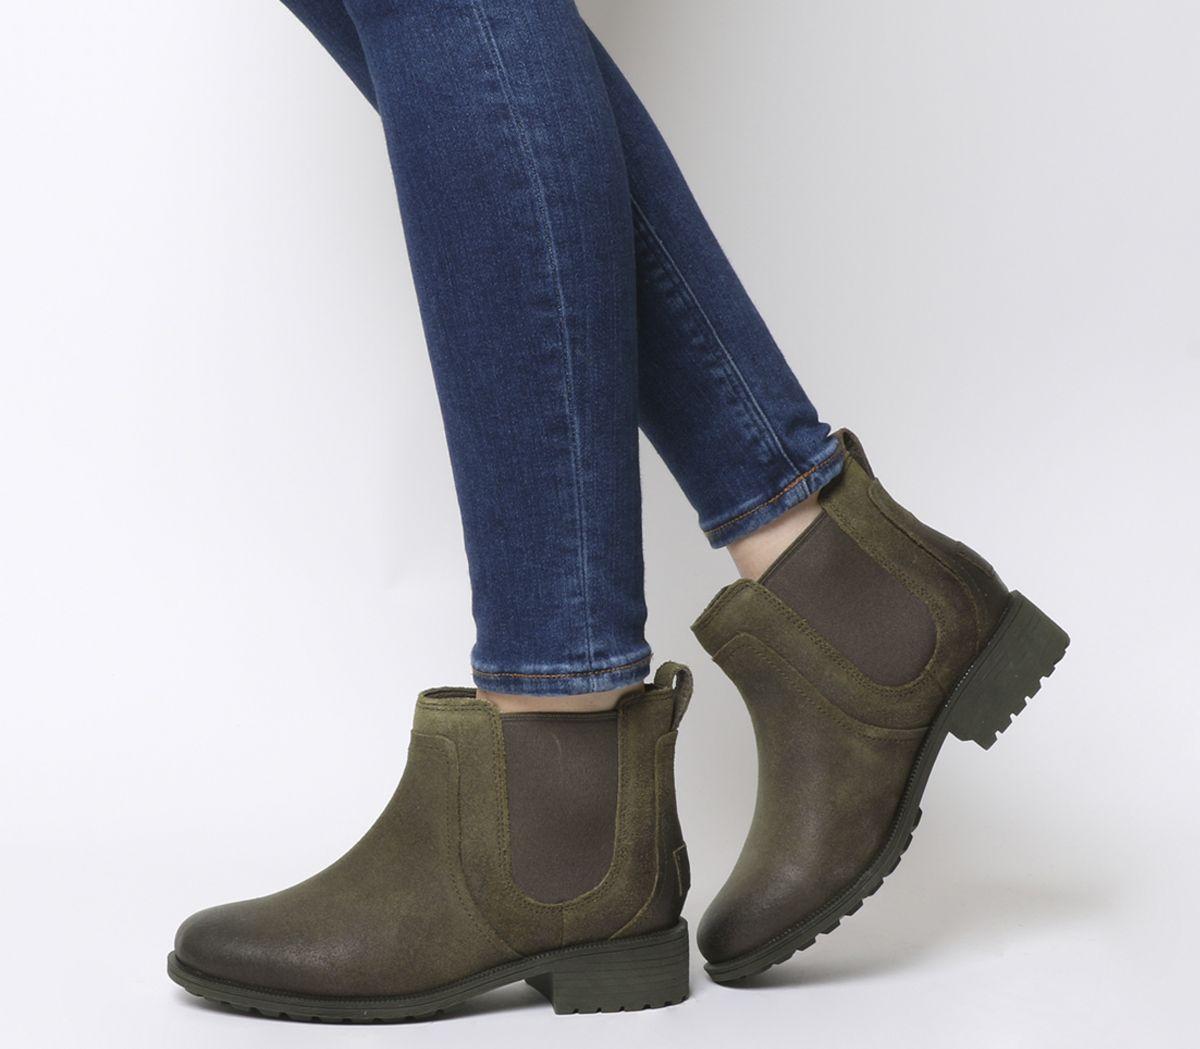 78f7c312047 Bonham Chelsea Boot II